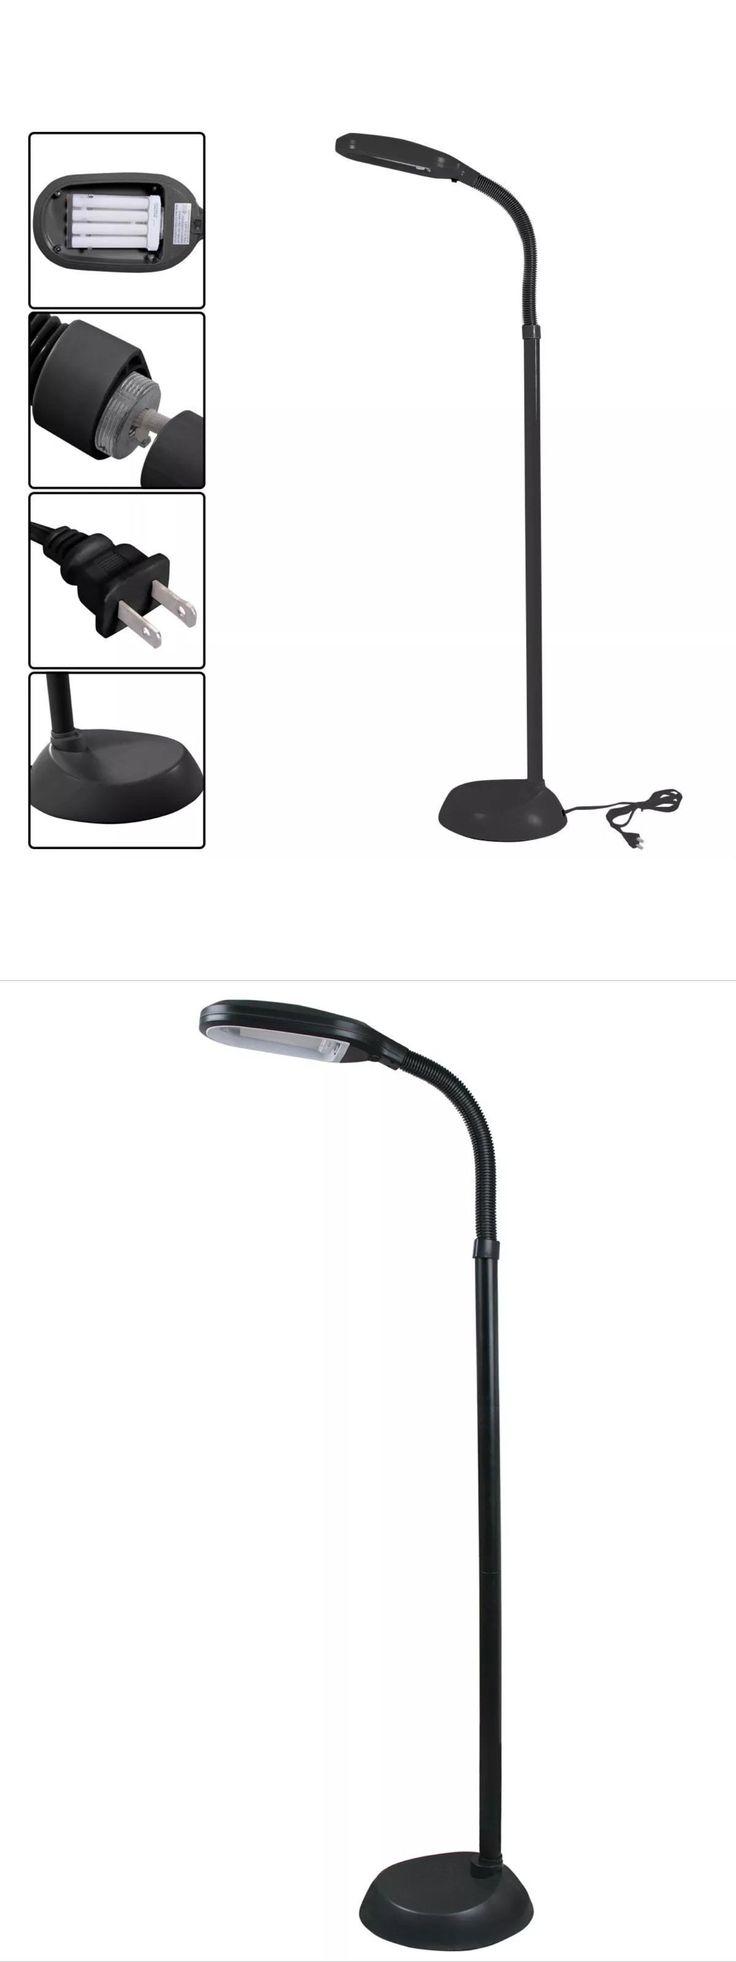 False Eyelashes and Adhesives: Eyelash Extension Kit Floor Beauty Lamp Furniture Equipment Glue (Bright Light) -> BUY IT NOW ONLY: $59.99 on eBay!